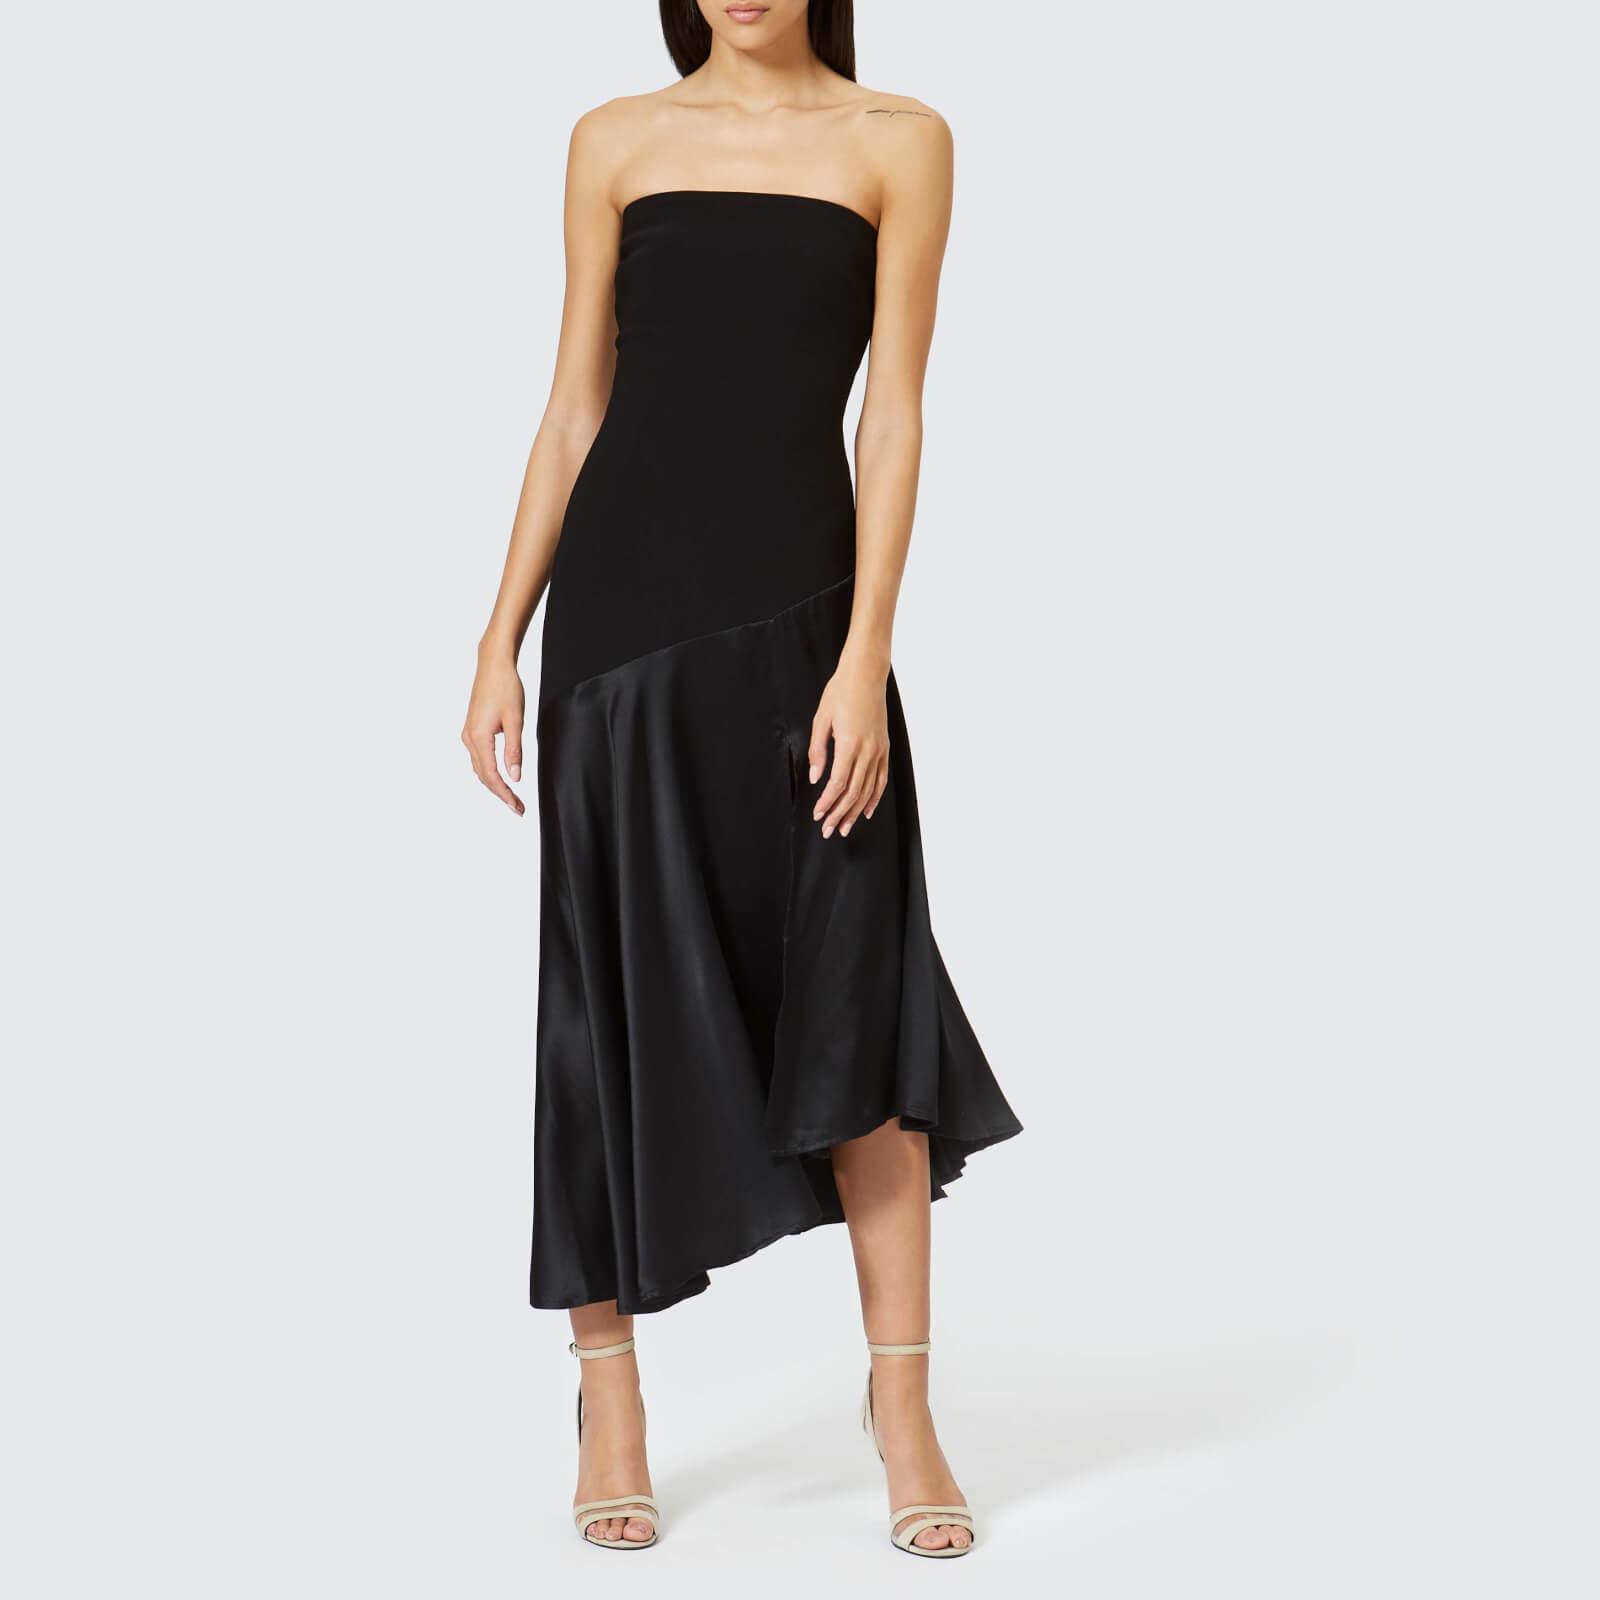 Bec & Bridge Women's Natalia Strapless Dress - Black - UK 10 - Black